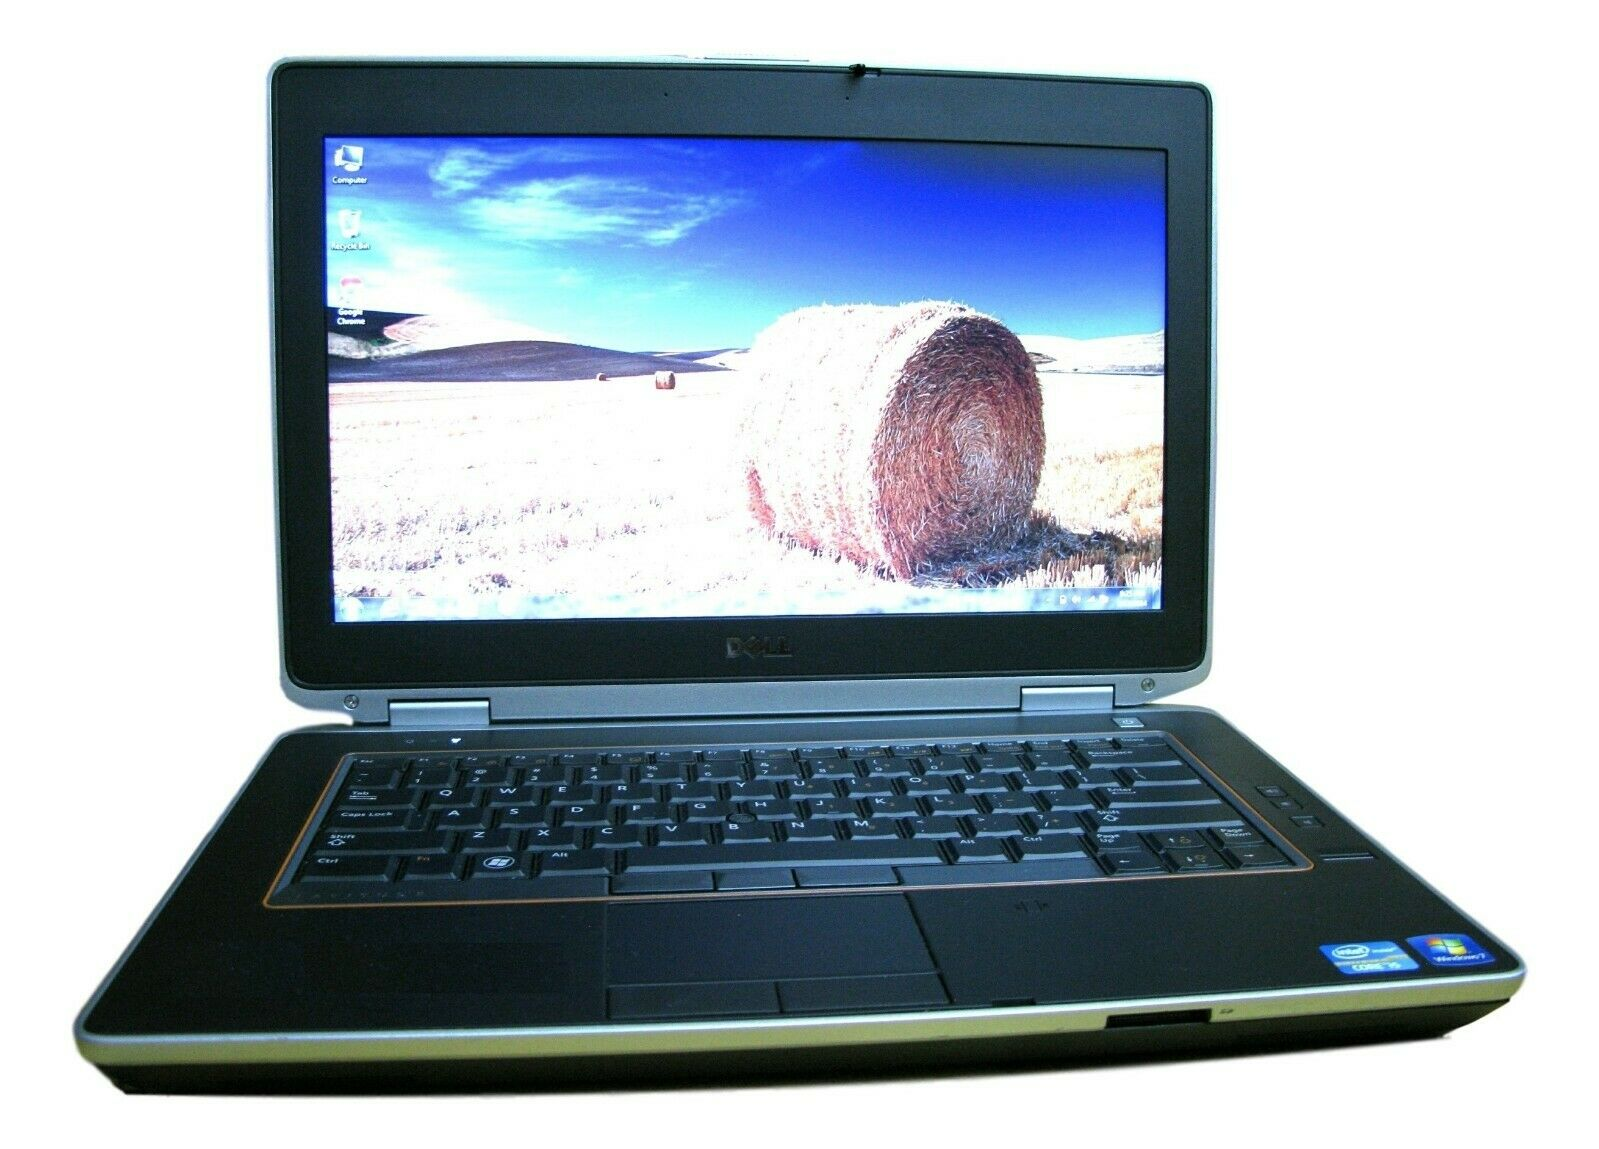 Laptop Windows - Dell Latitude E6420 Laptop Windows 7 Core i5 2.5 Ghz 8GB RAM 1TB HD DVDRW WIFI